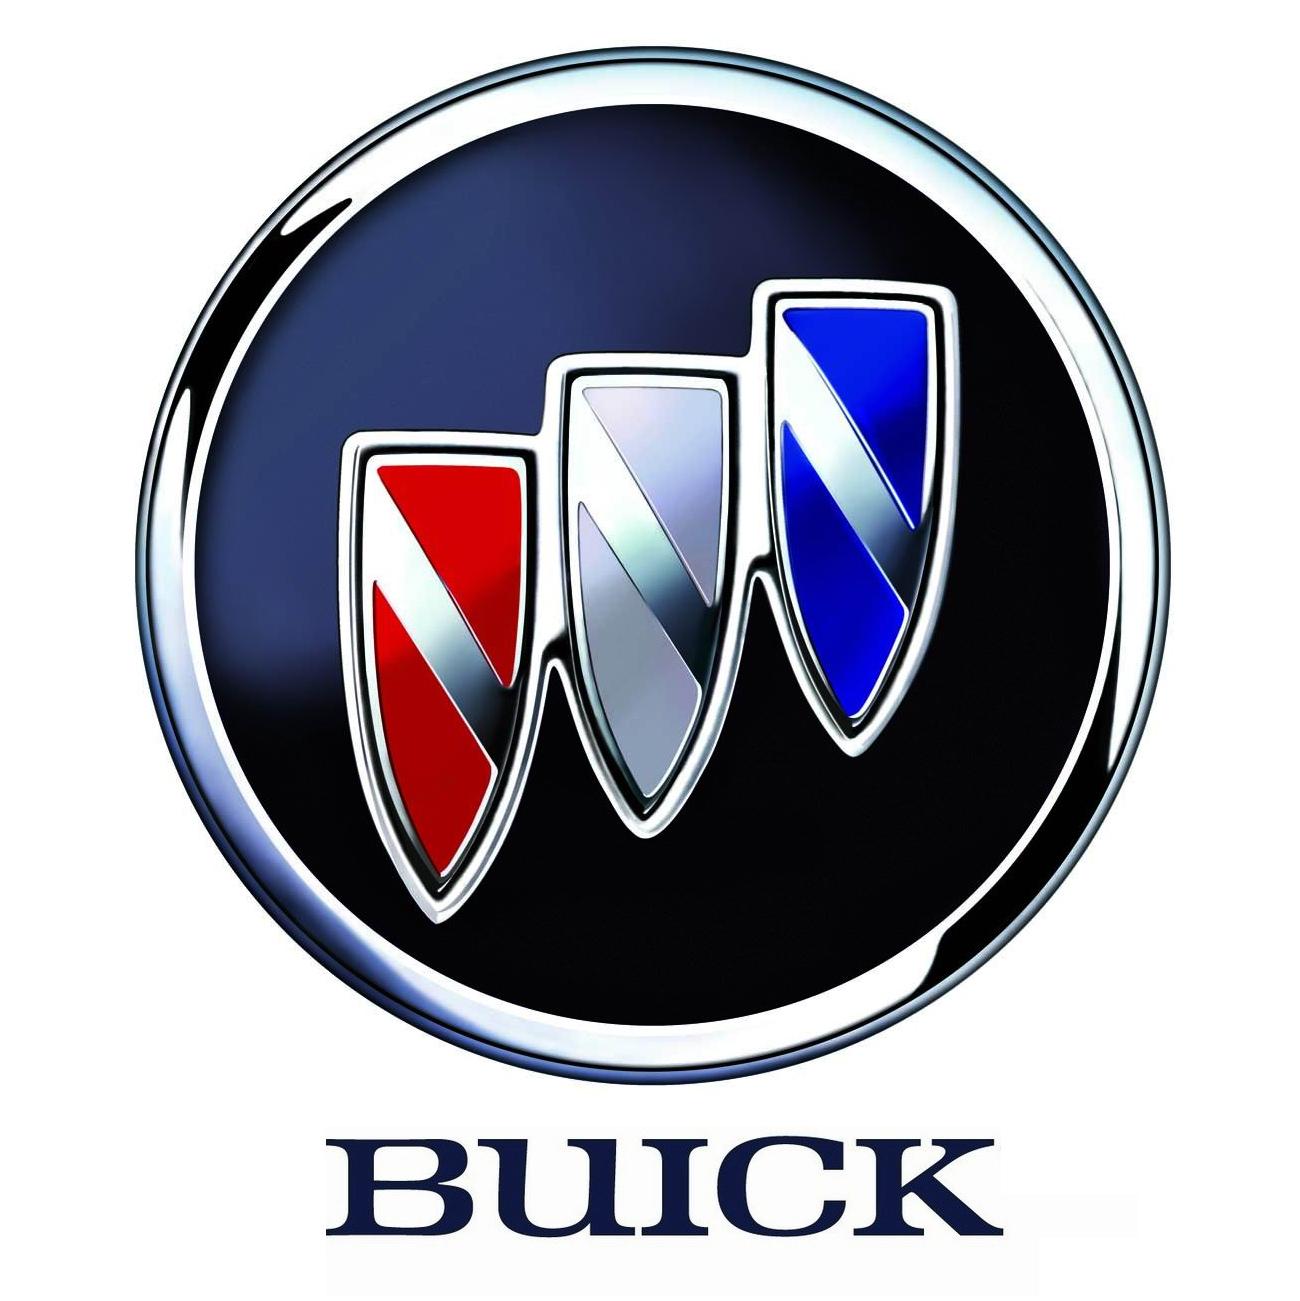 Buick-symbol-3.jpg